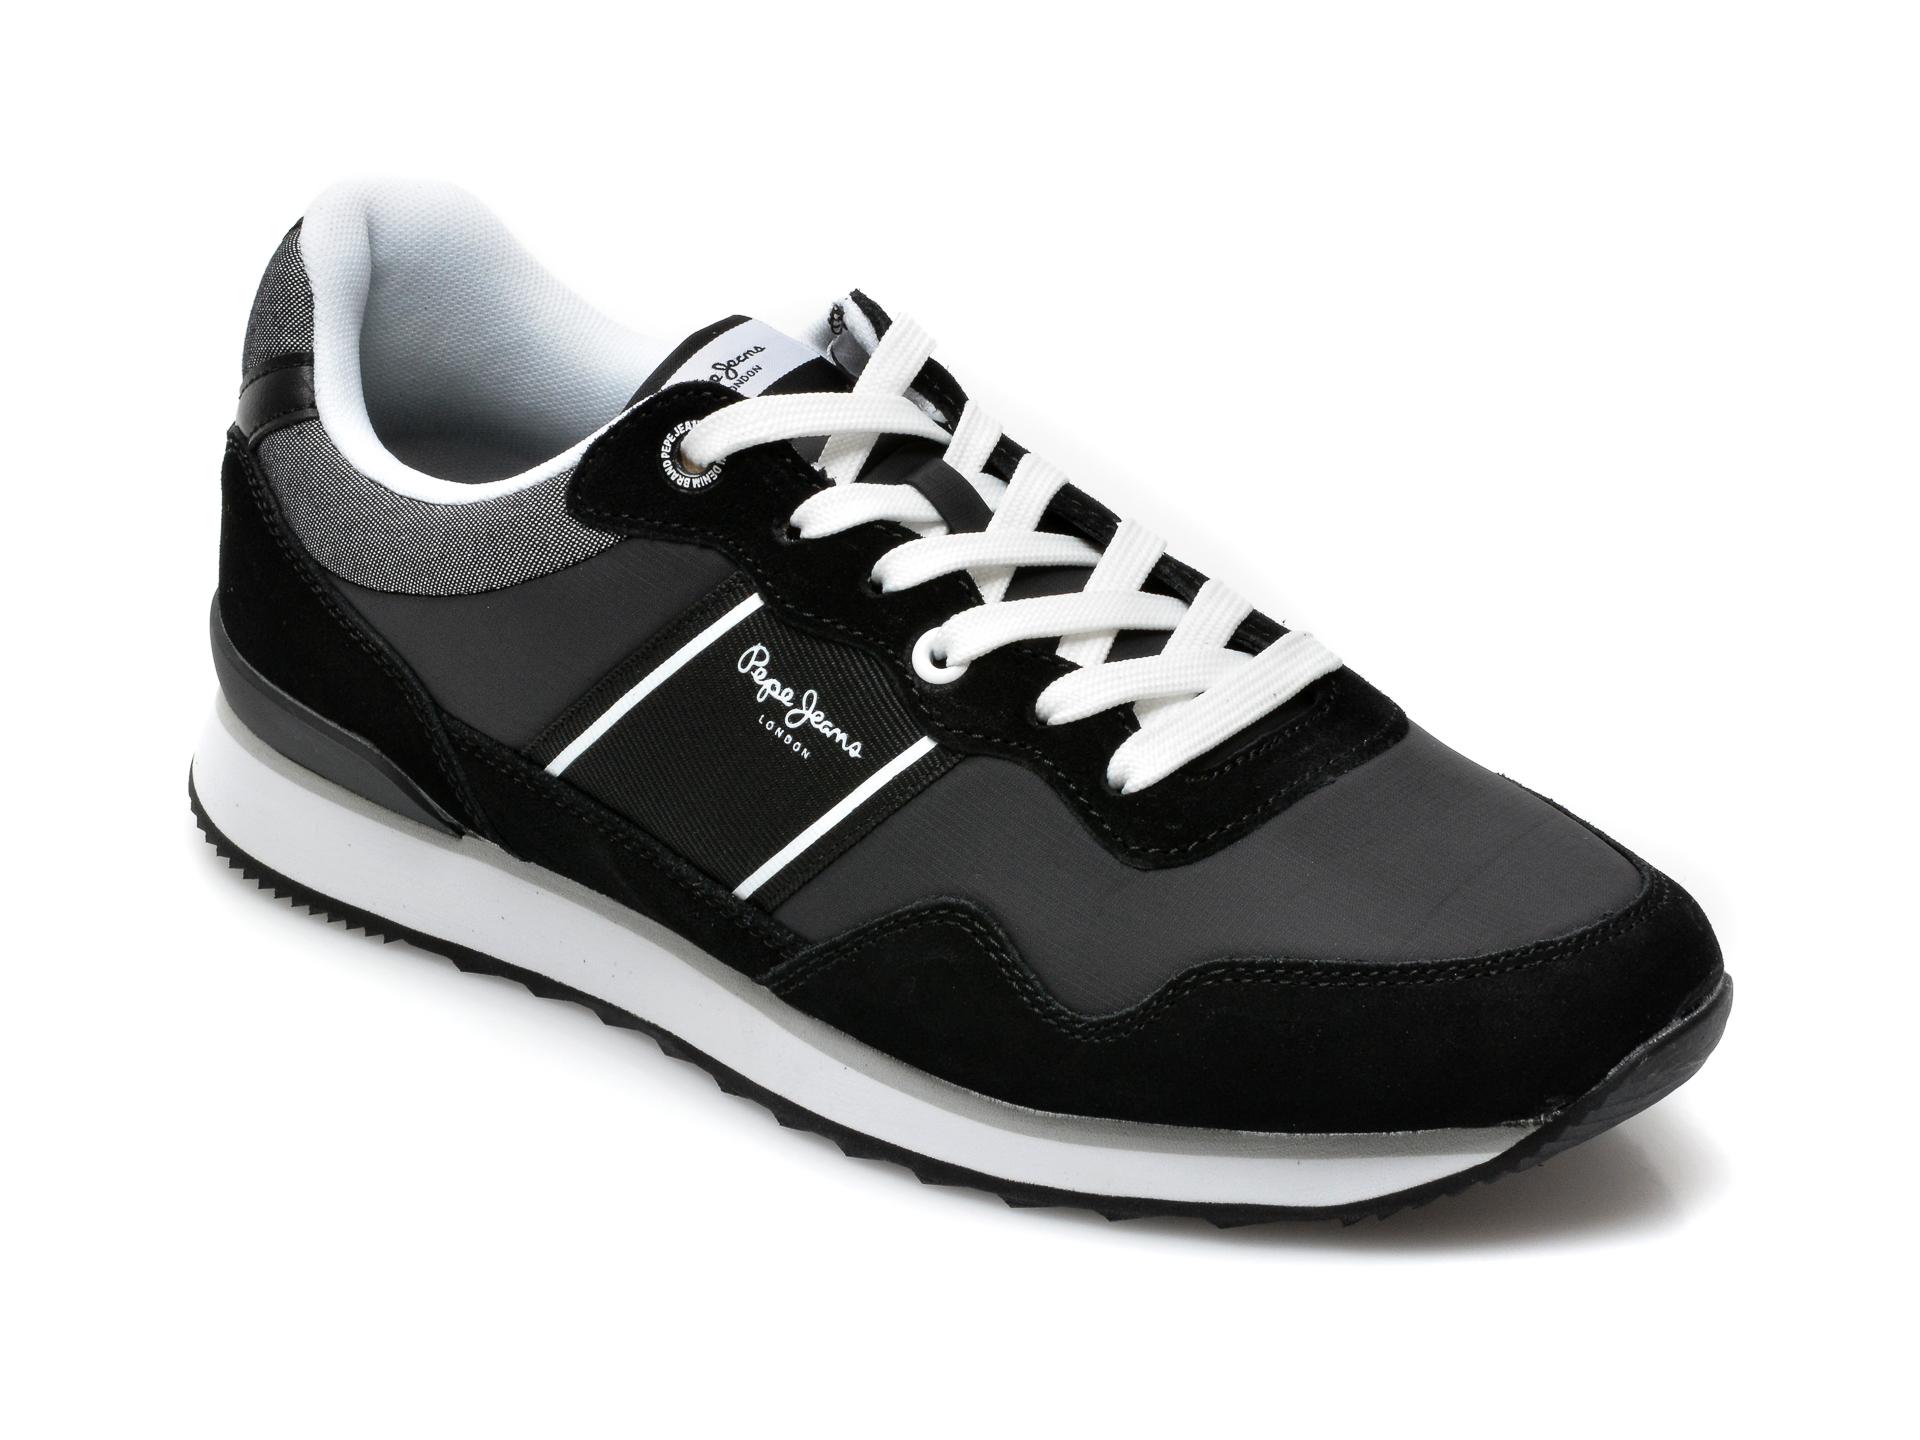 Pantofi sport PEPE JEANS negri, 3070299, din material textil si piele intoarsa imagine otter.ro